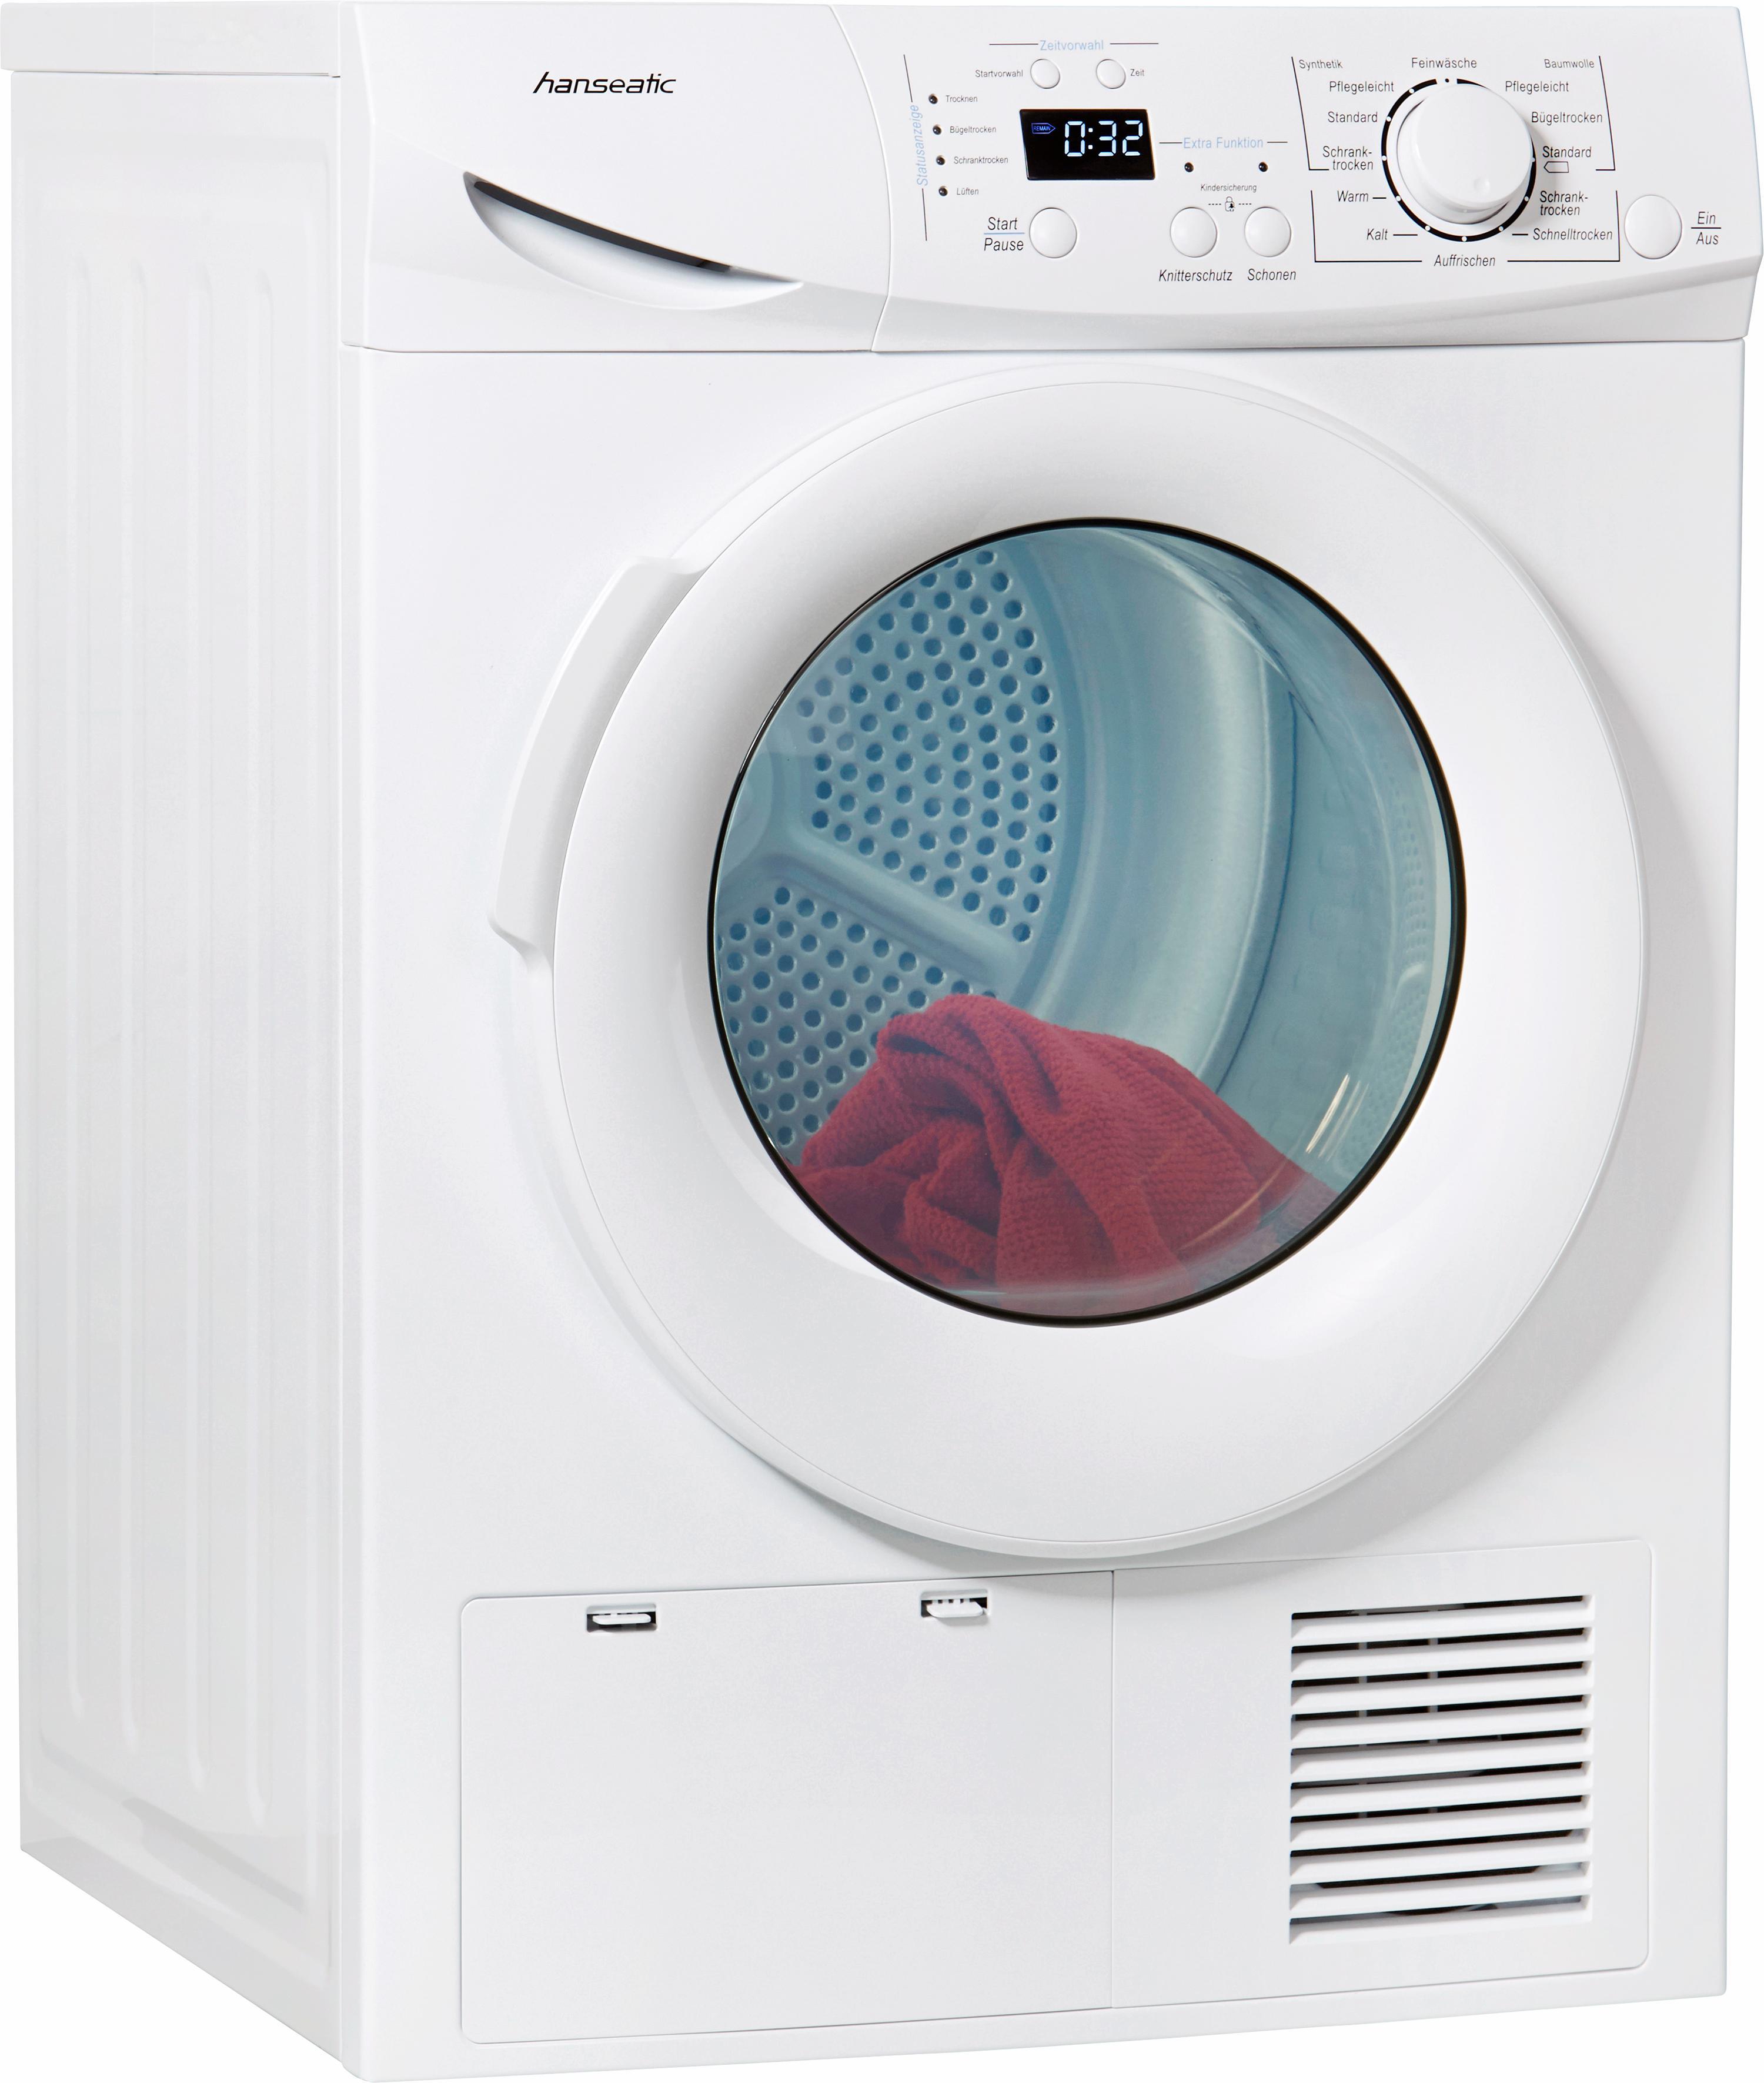 Hanseatic Kondenstrockner HKT 8BGT 8 kg   Bad > Waschmaschinen und Trockner > Kondenstrockner   Weiß   Hanseatic